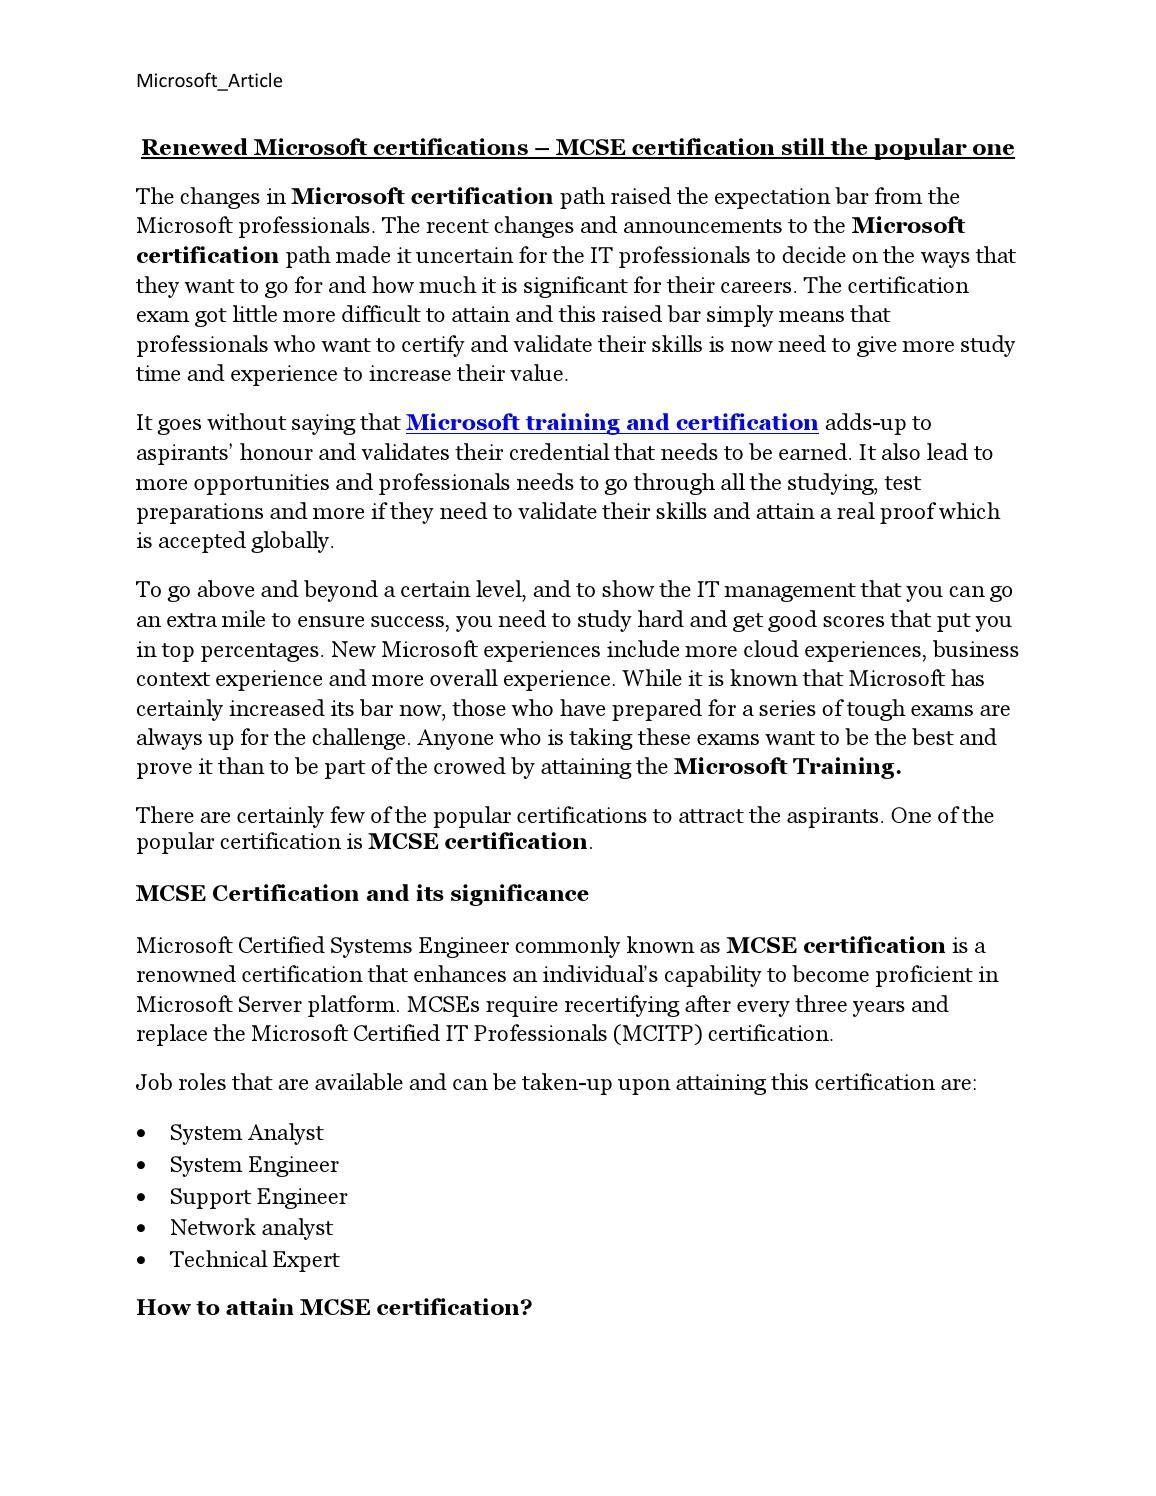 Microsoft certification pdf by ittraining issuu xflitez Gallery